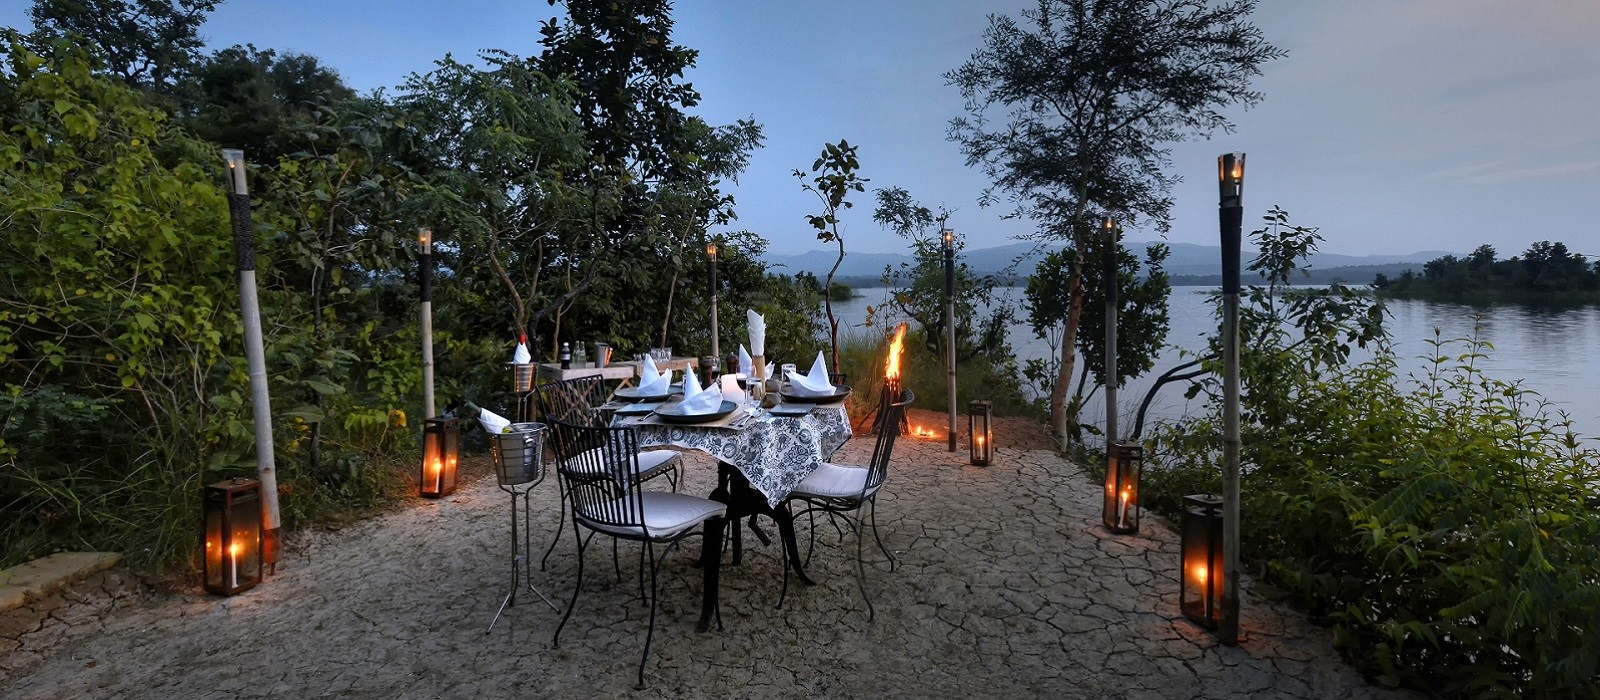 Hotel Denwa Backwater Escape Zentral- & Westindien